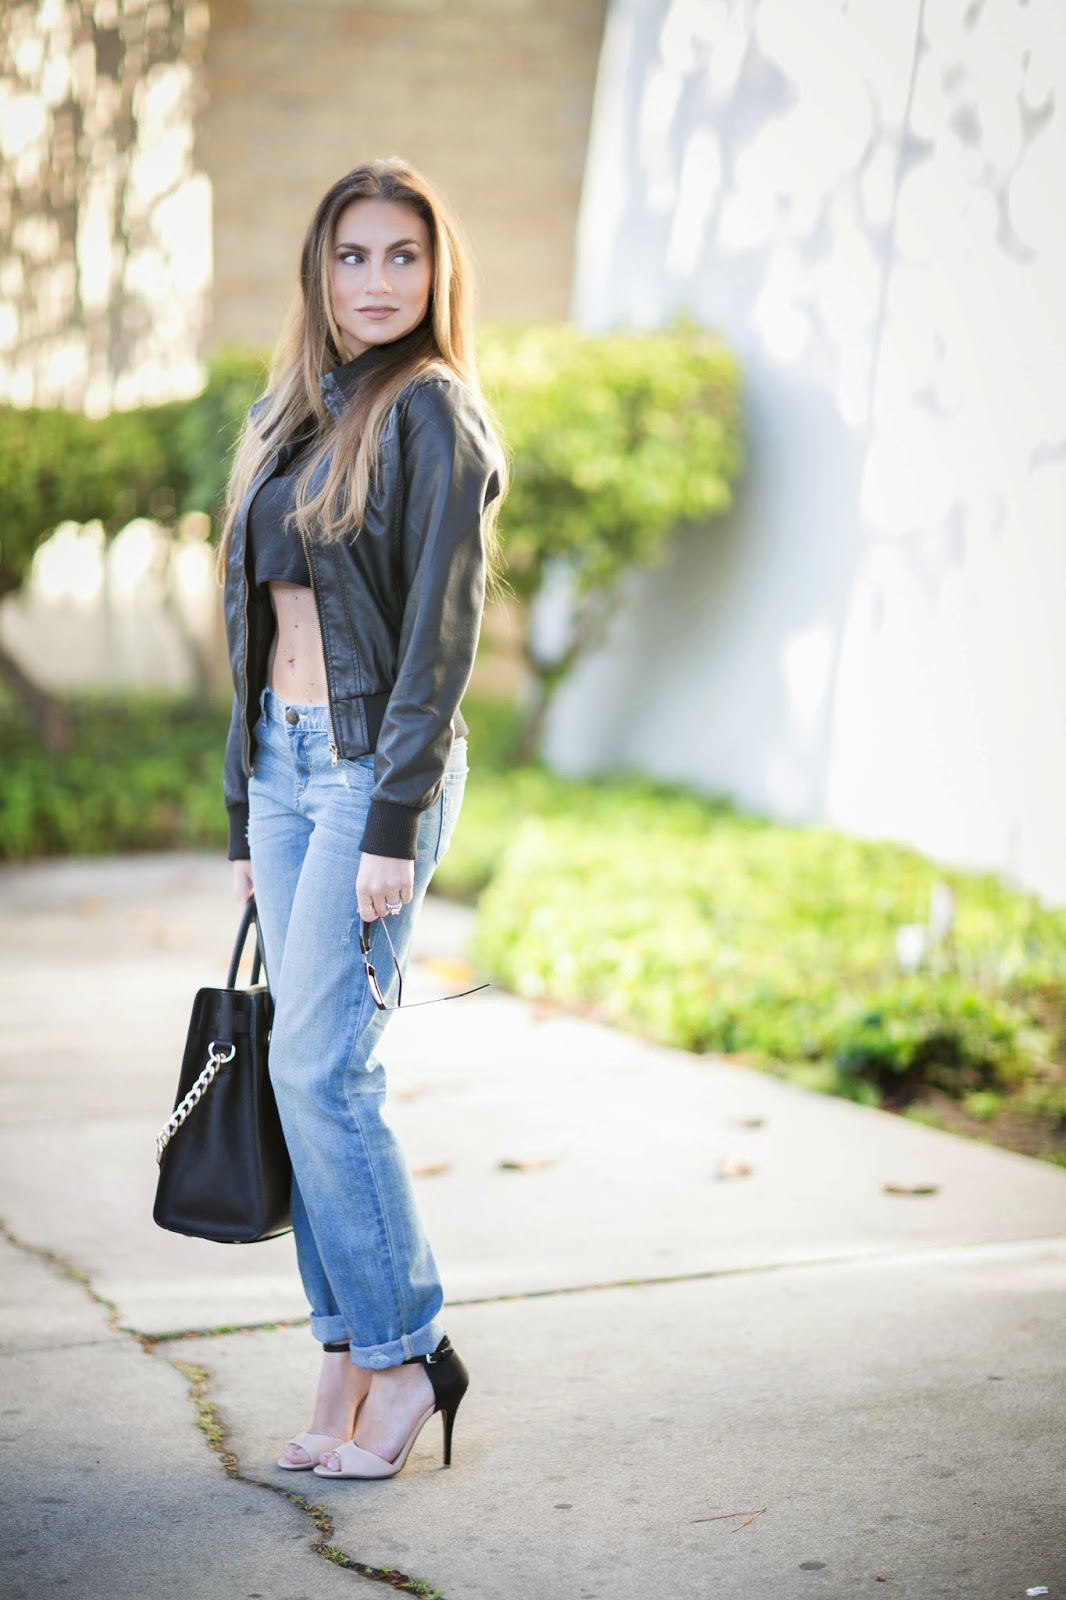 Vote For Me Skype Boyfriend Jeans Fashion Blogger Challenge Hello Gorgeous By Angela Lanter